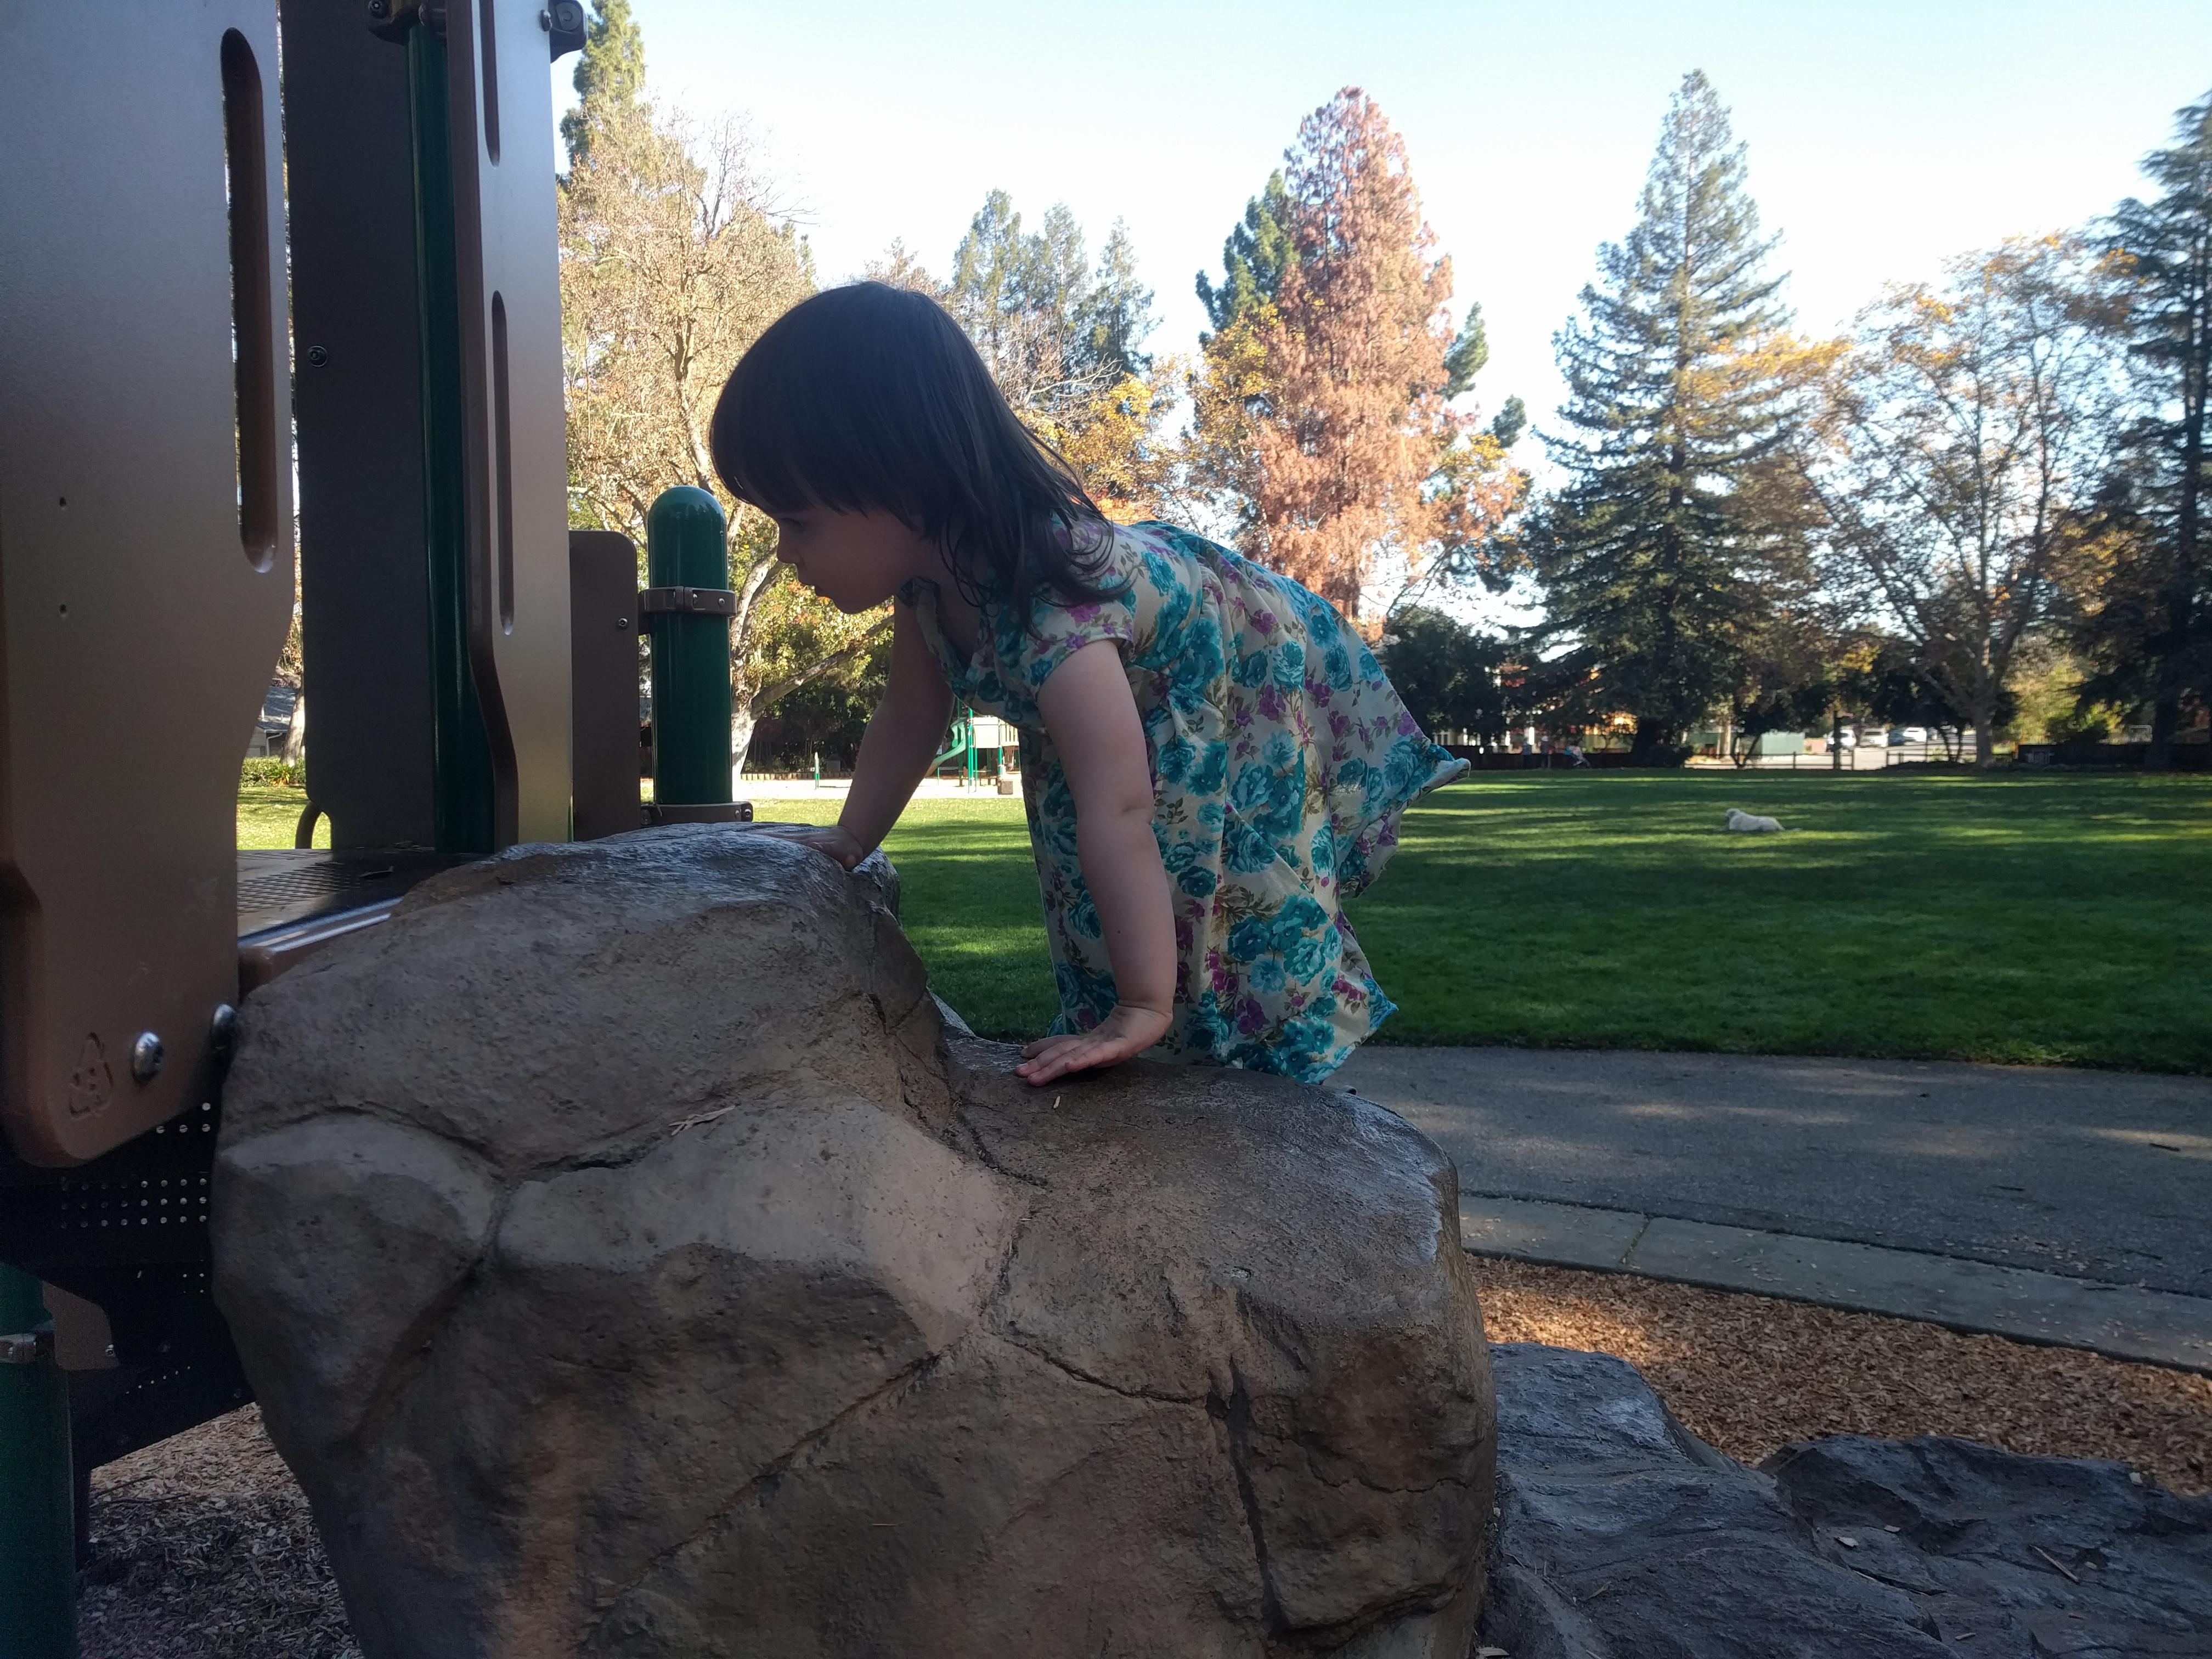 ashcrafts_park_climbing_rocks